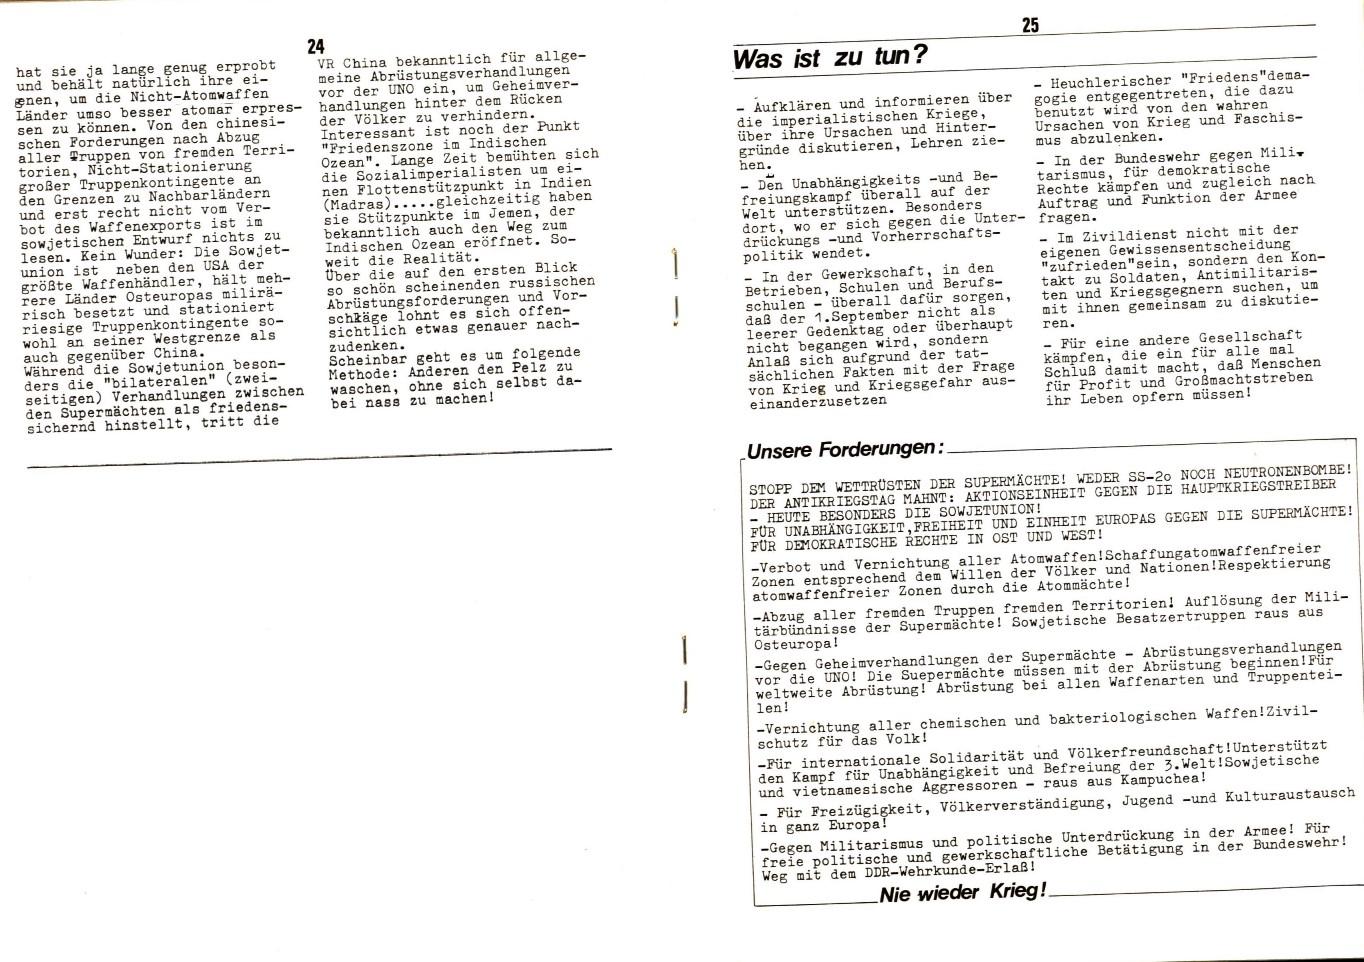 KJVD_1979_Dokumente_zum_Antikriegstag_12